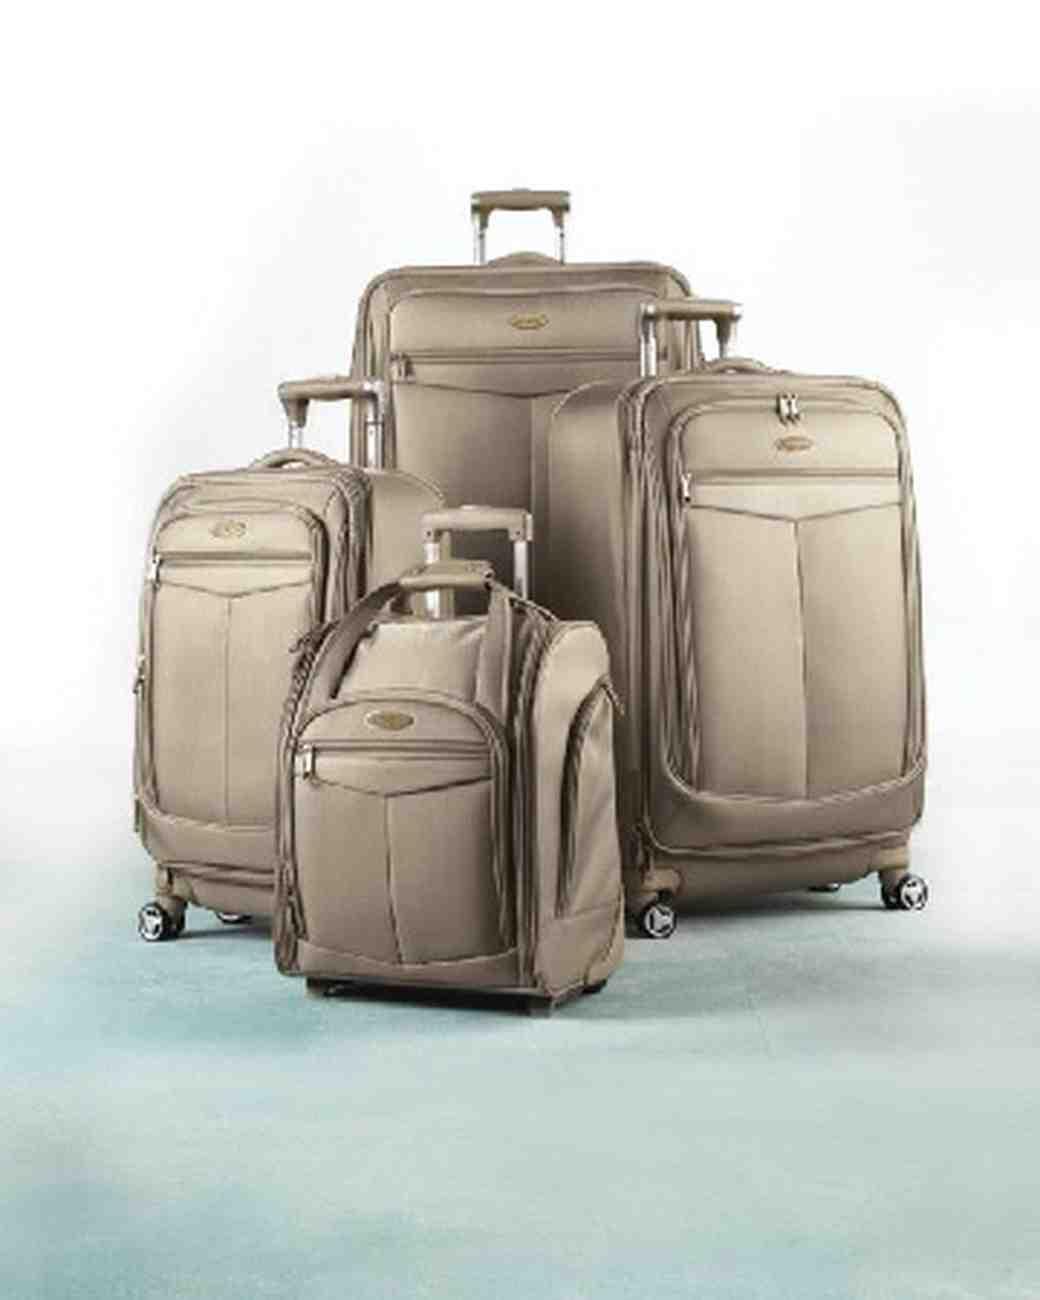 macys-luggage-4.jpg